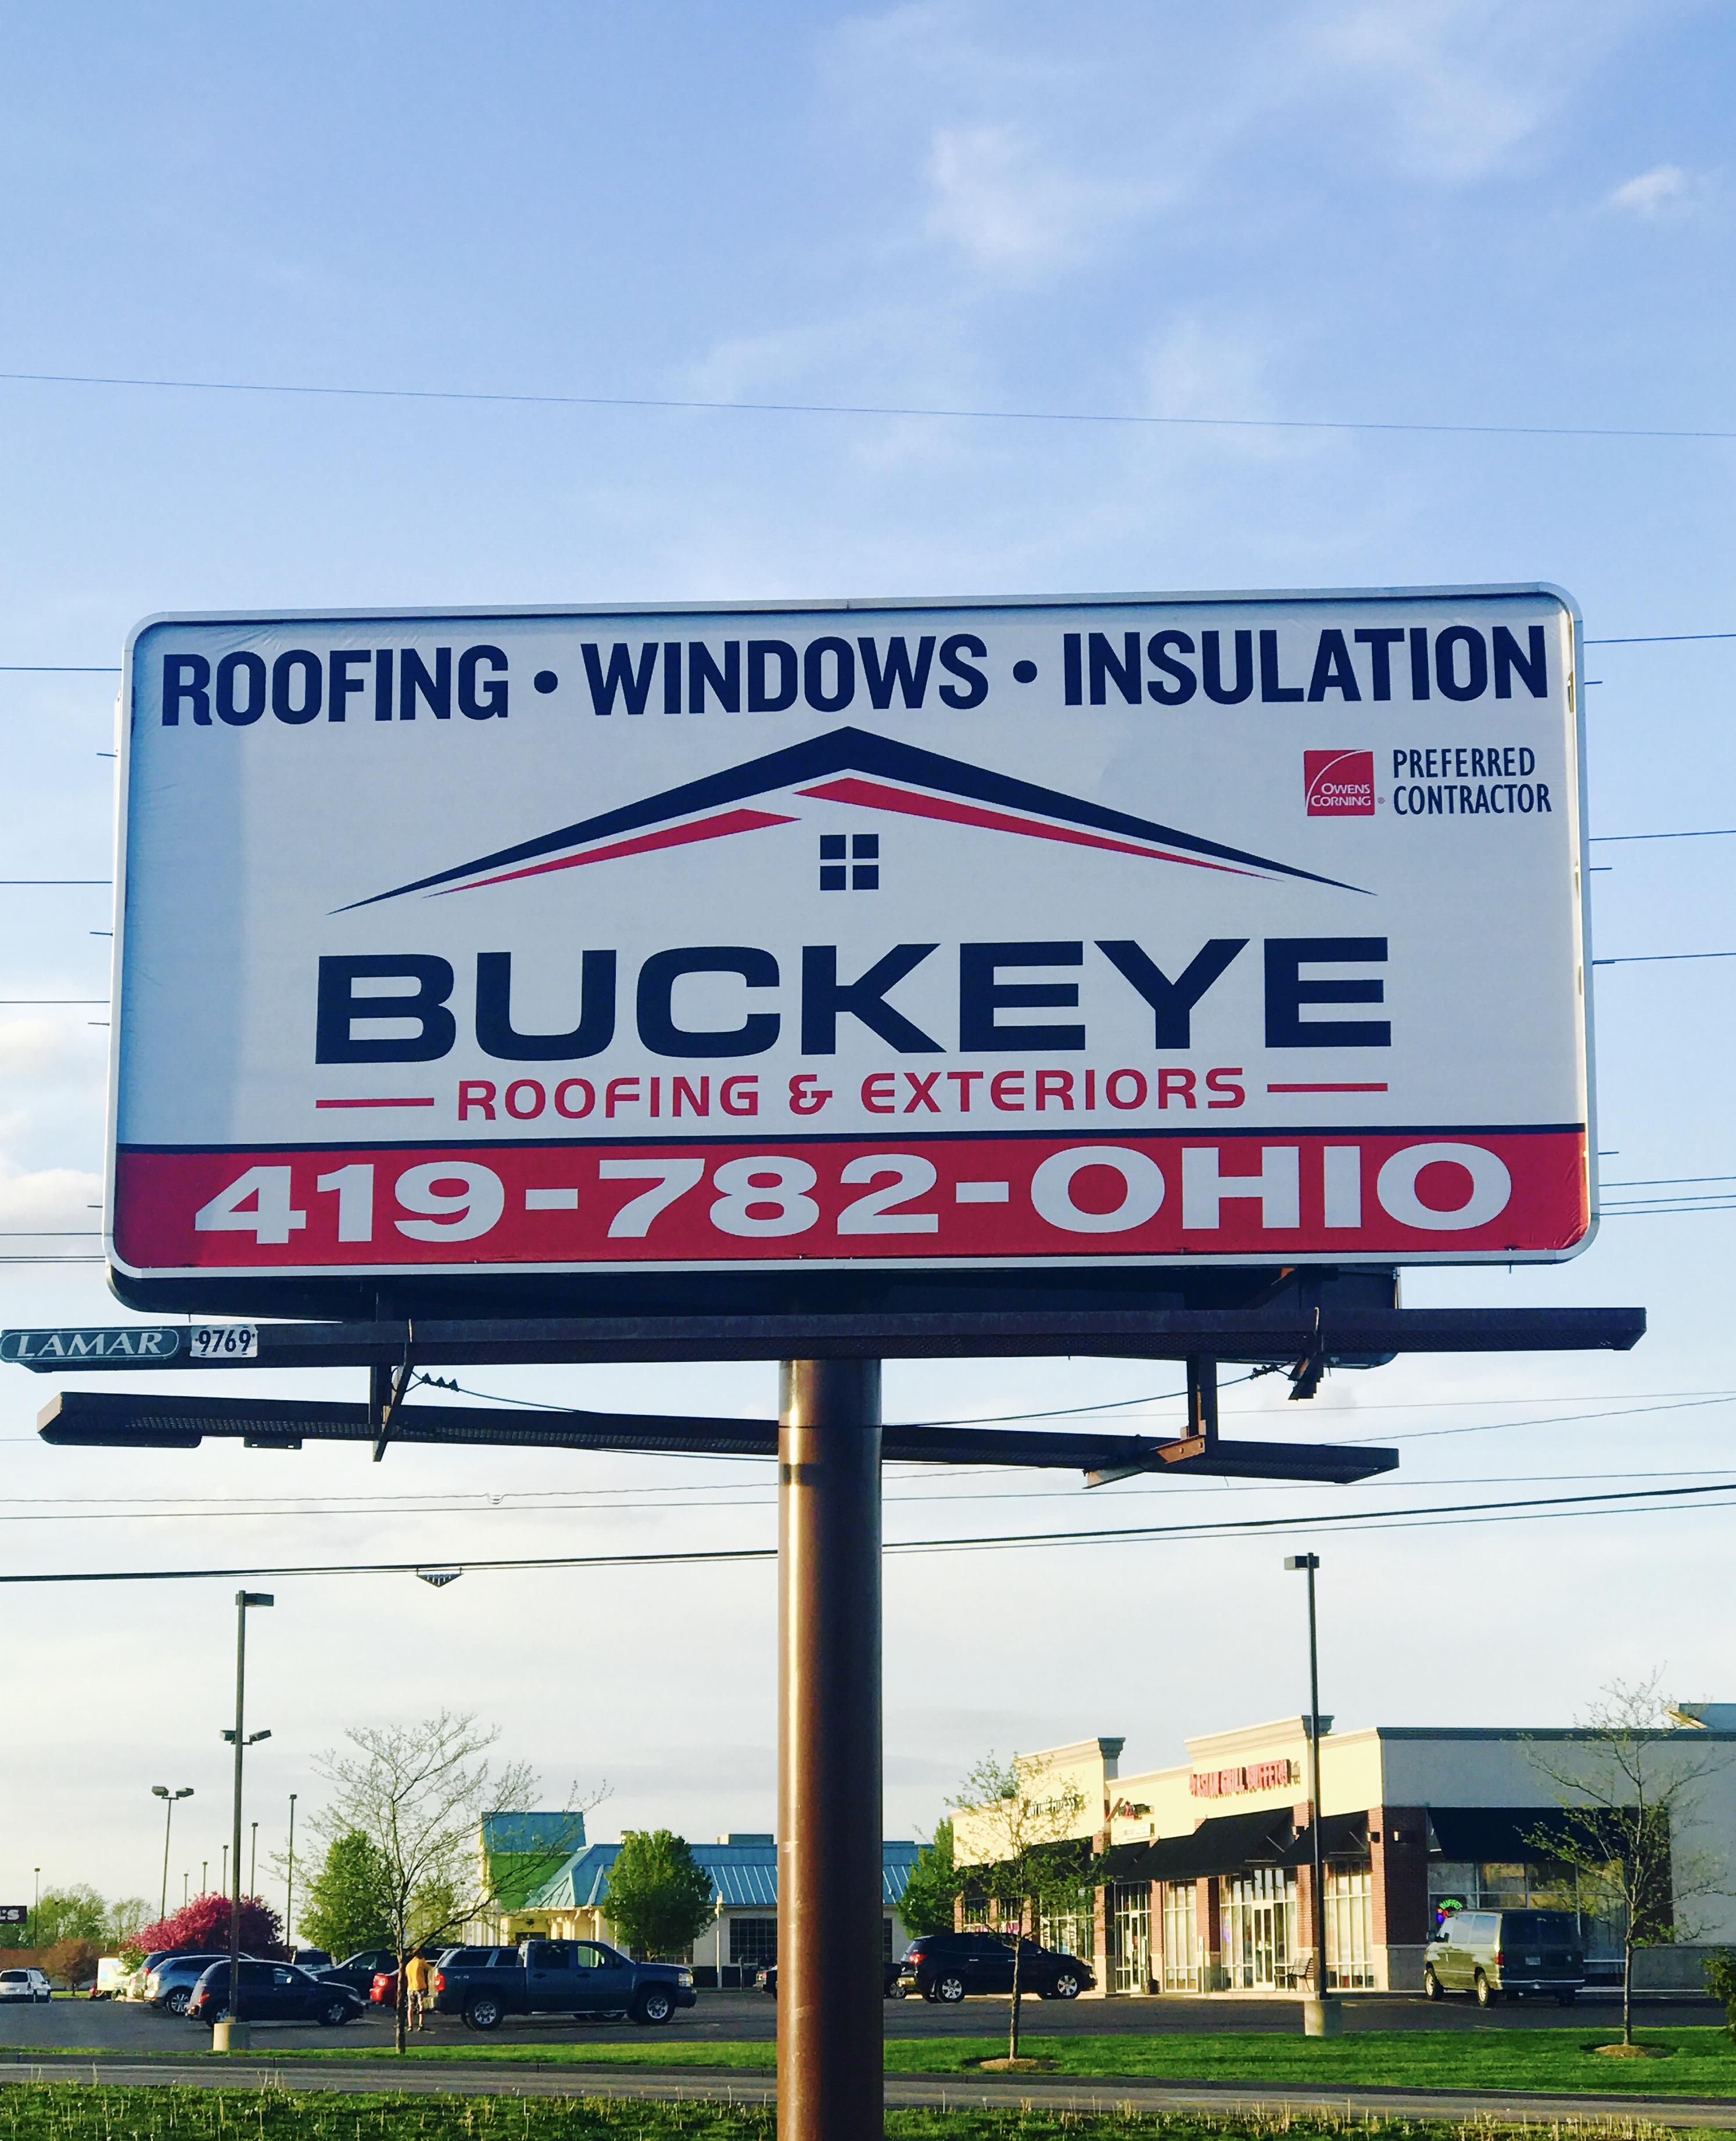 Exceptional Buckeye Roofing U0026 Exteriors, Llc Photos